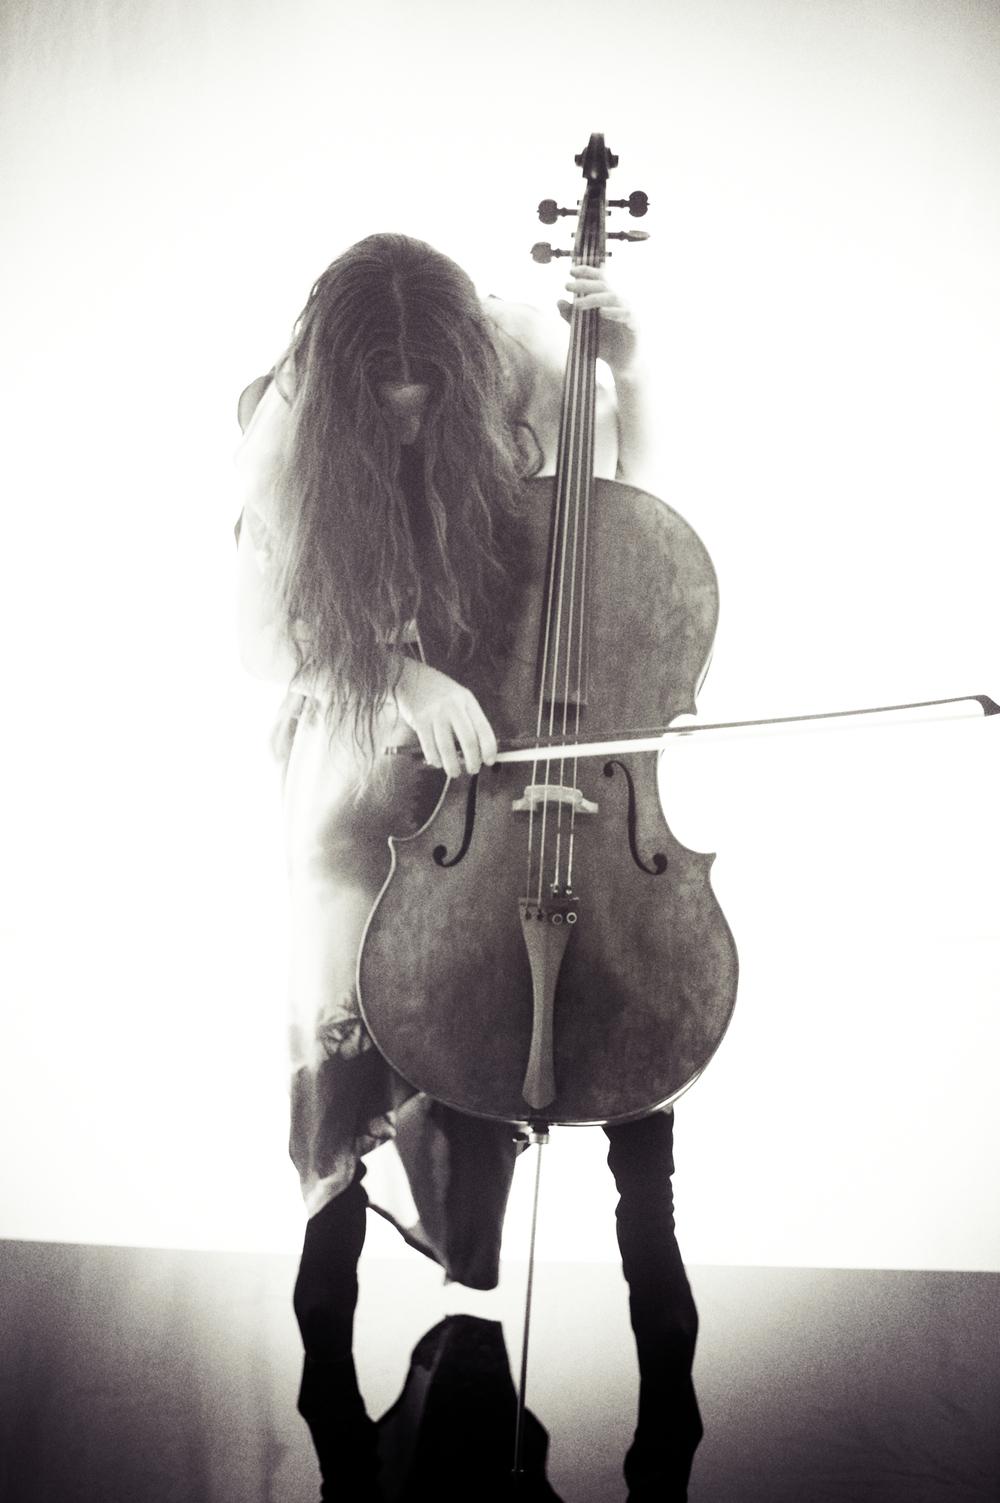 Maya Beiser, photograph by ioulex